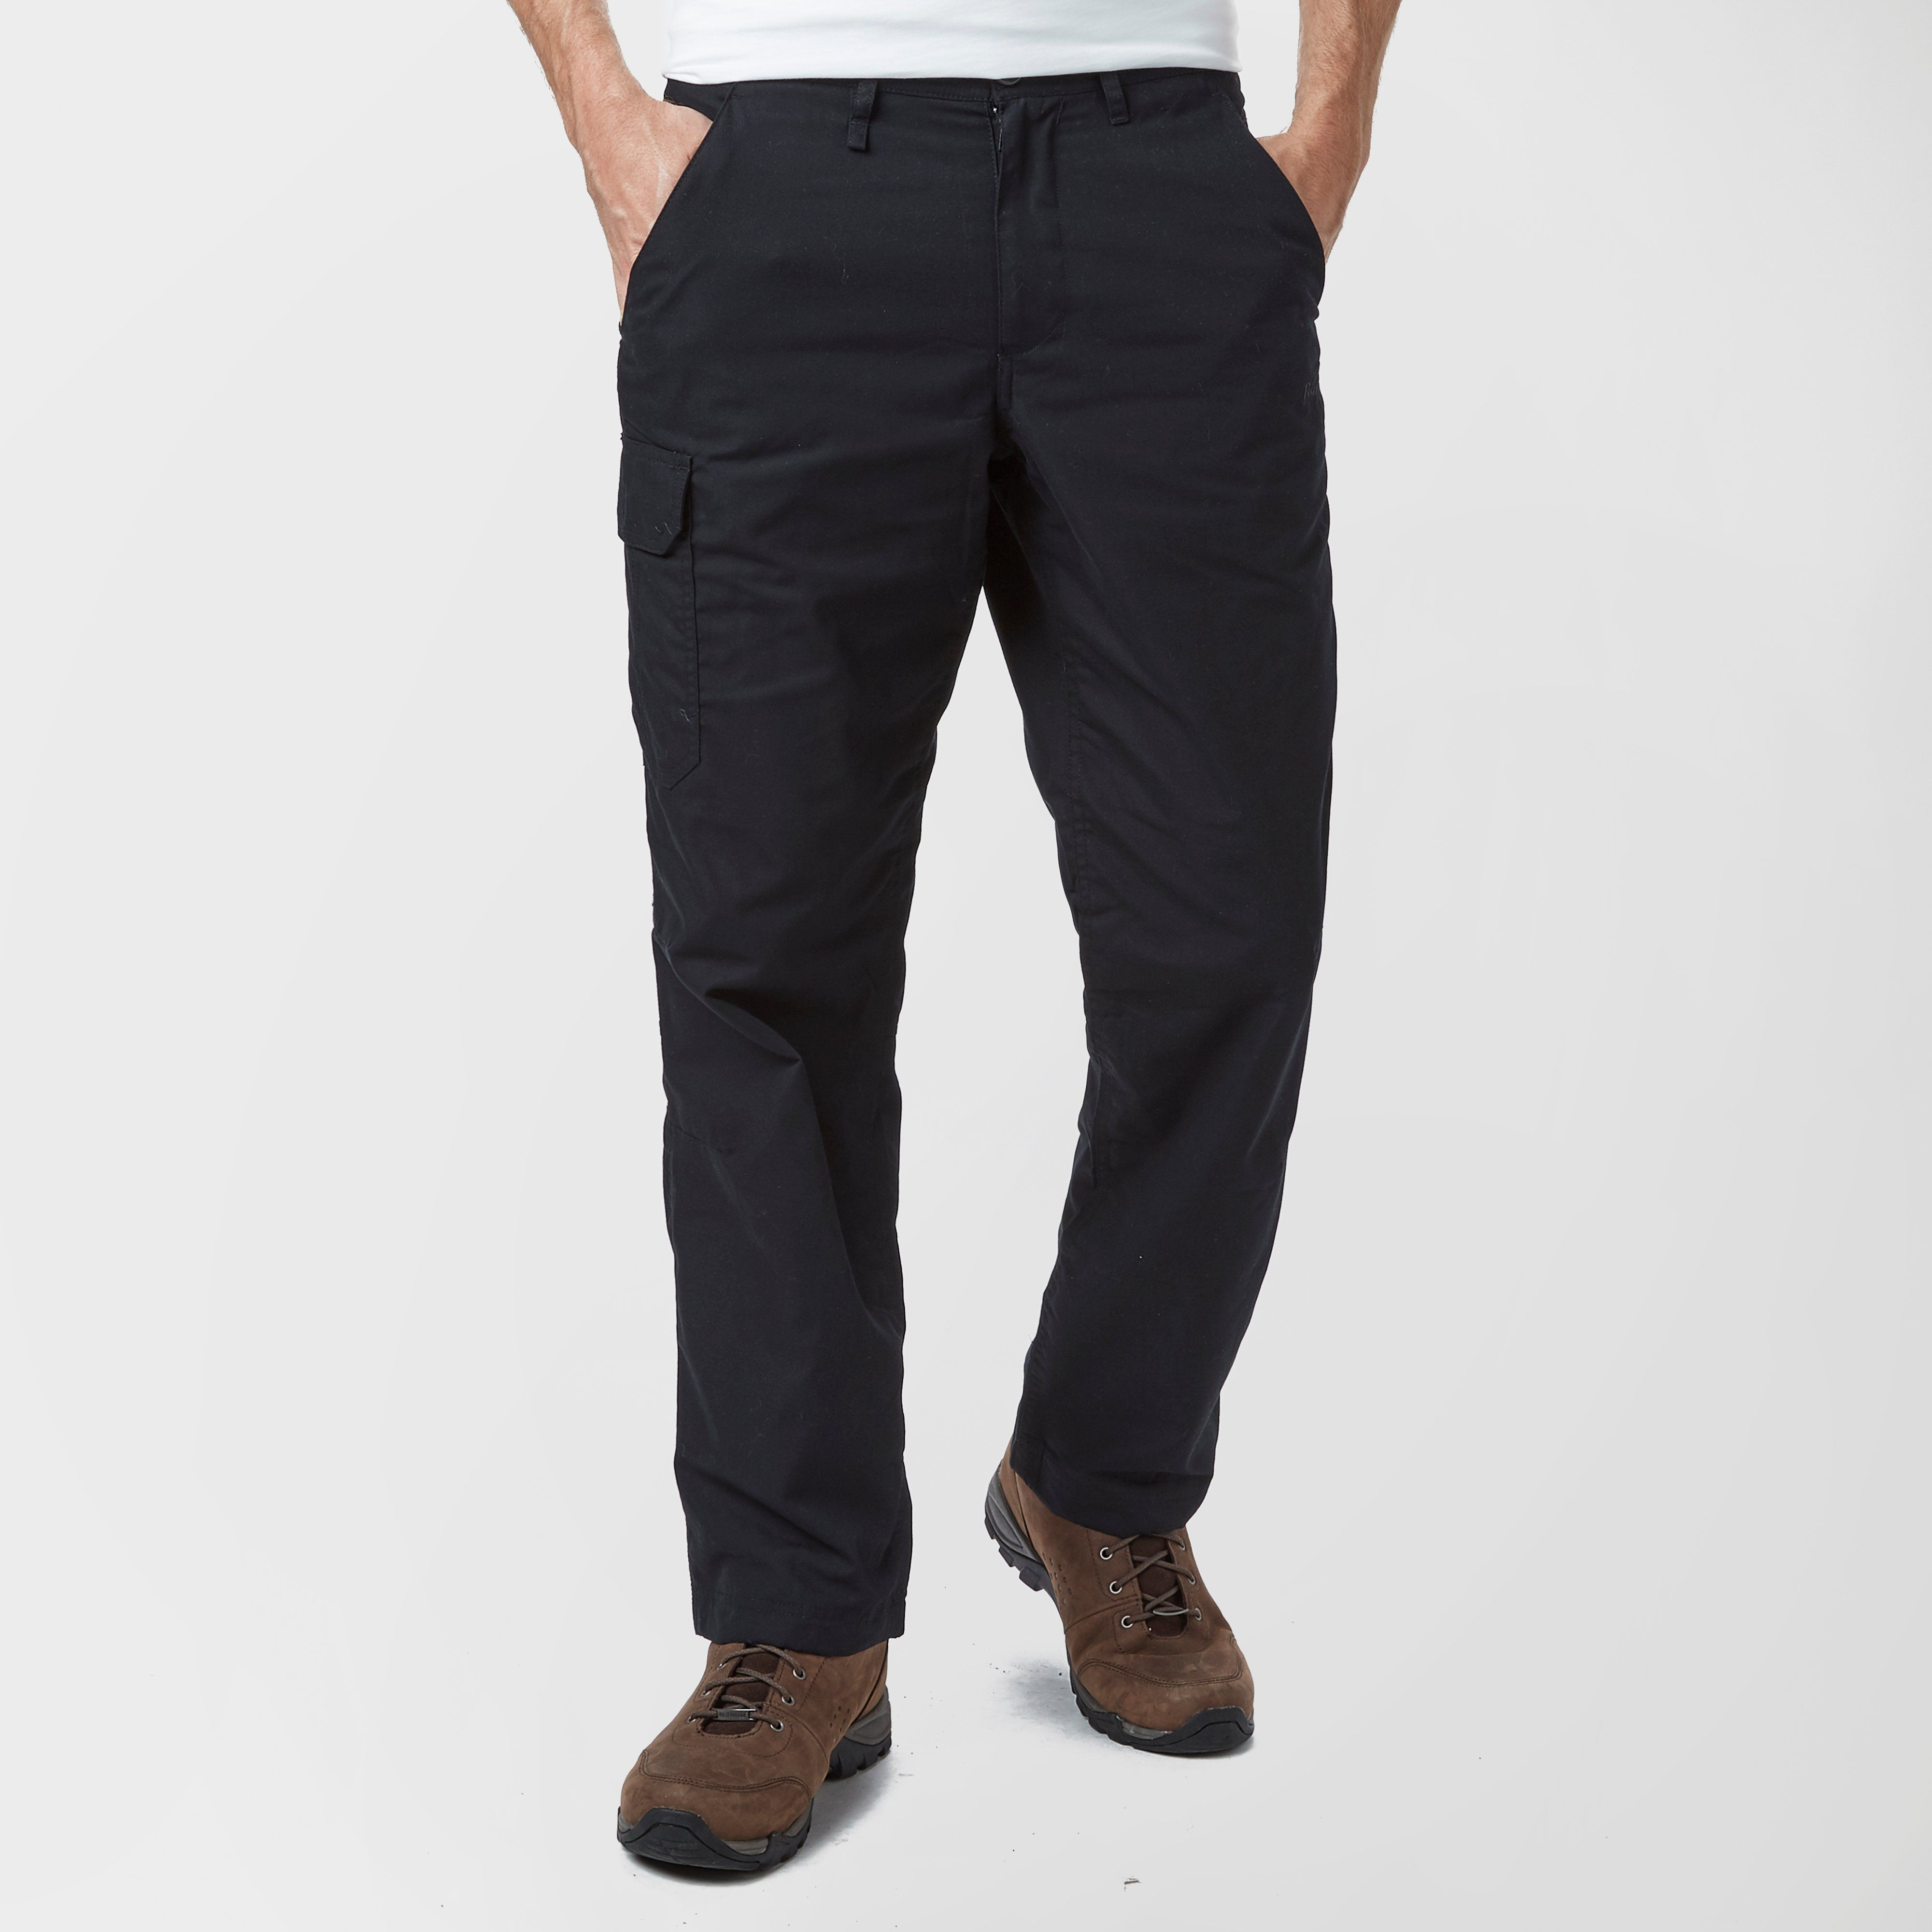 PETER STORM Men's Ramble II Lined Trousers